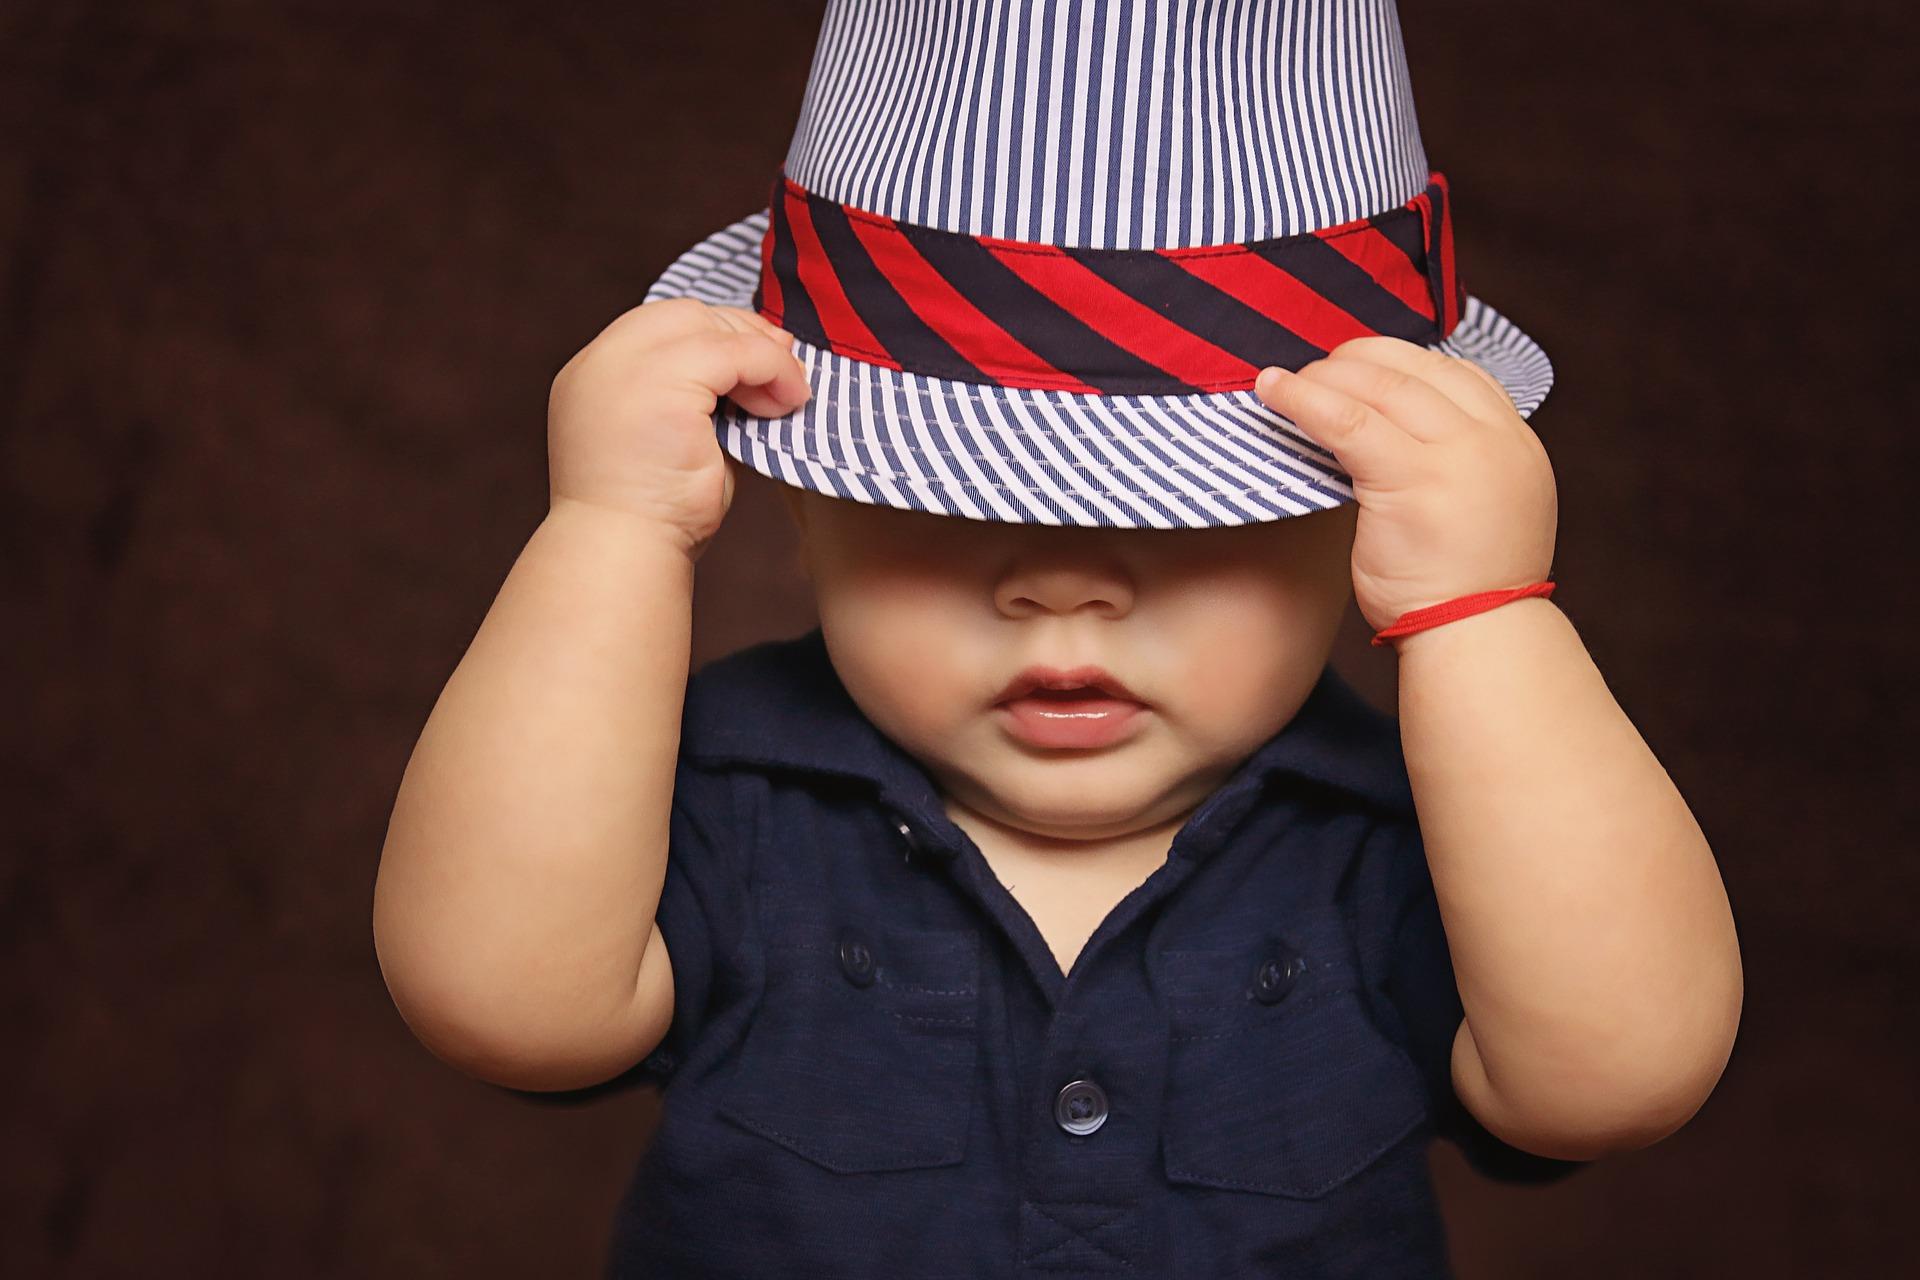 migliori cappelli uomo 2021